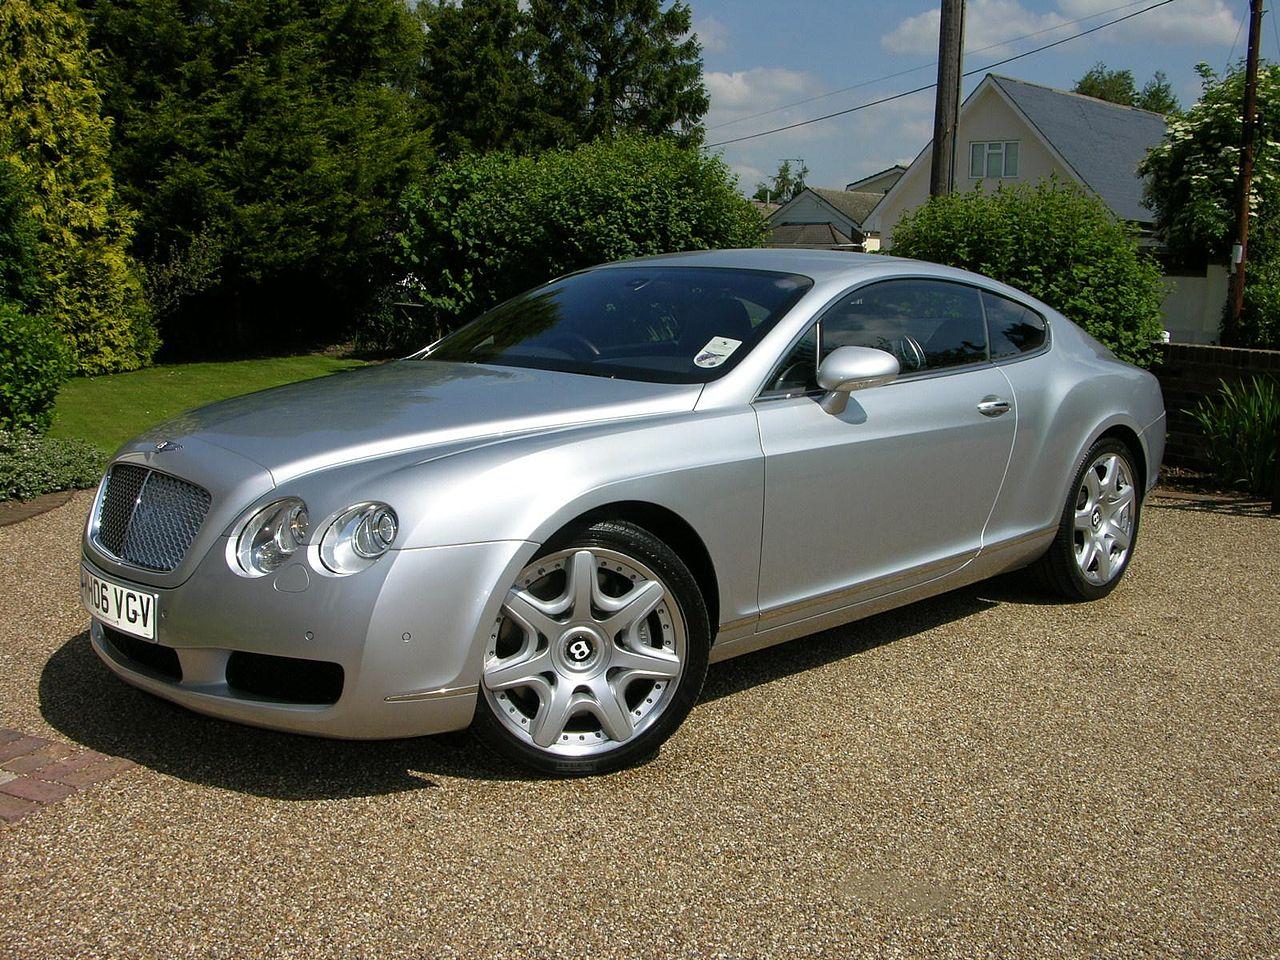 File:2006 Bentley Continental GT Mulliner - Flickr - The ...